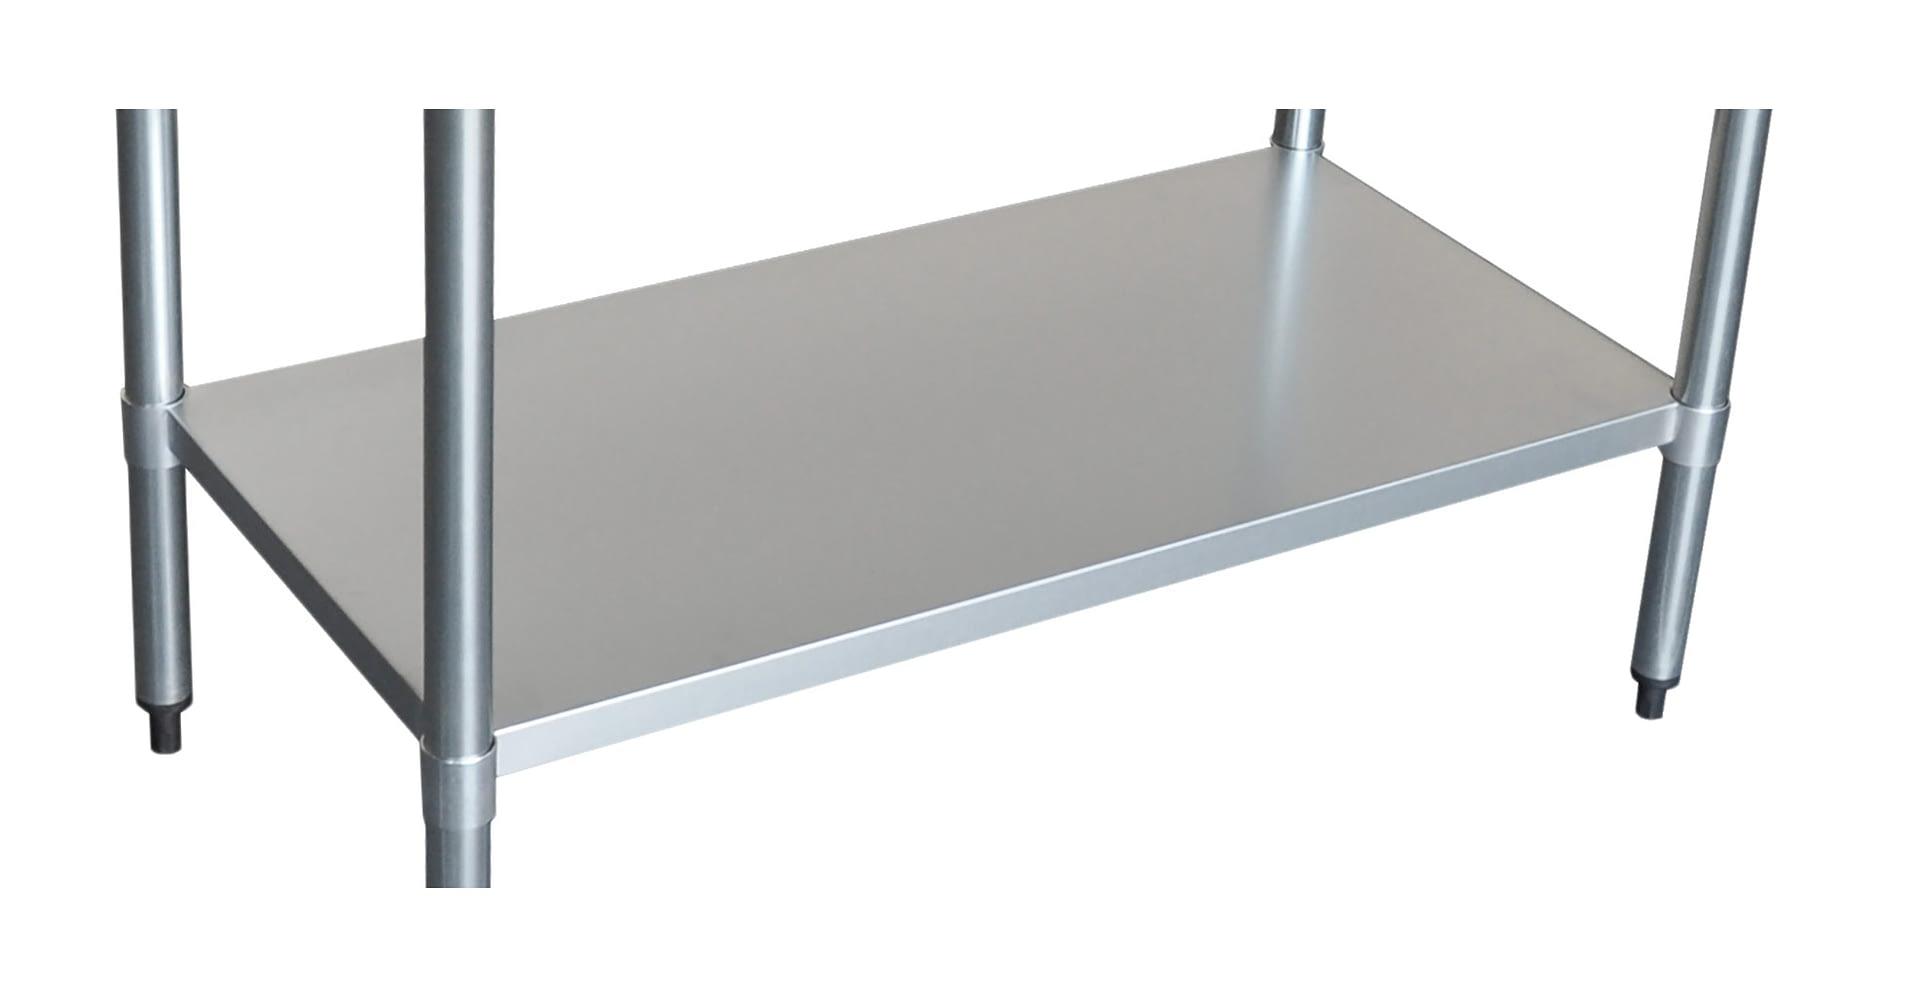 Stainless Undershelf for 3036 Bench